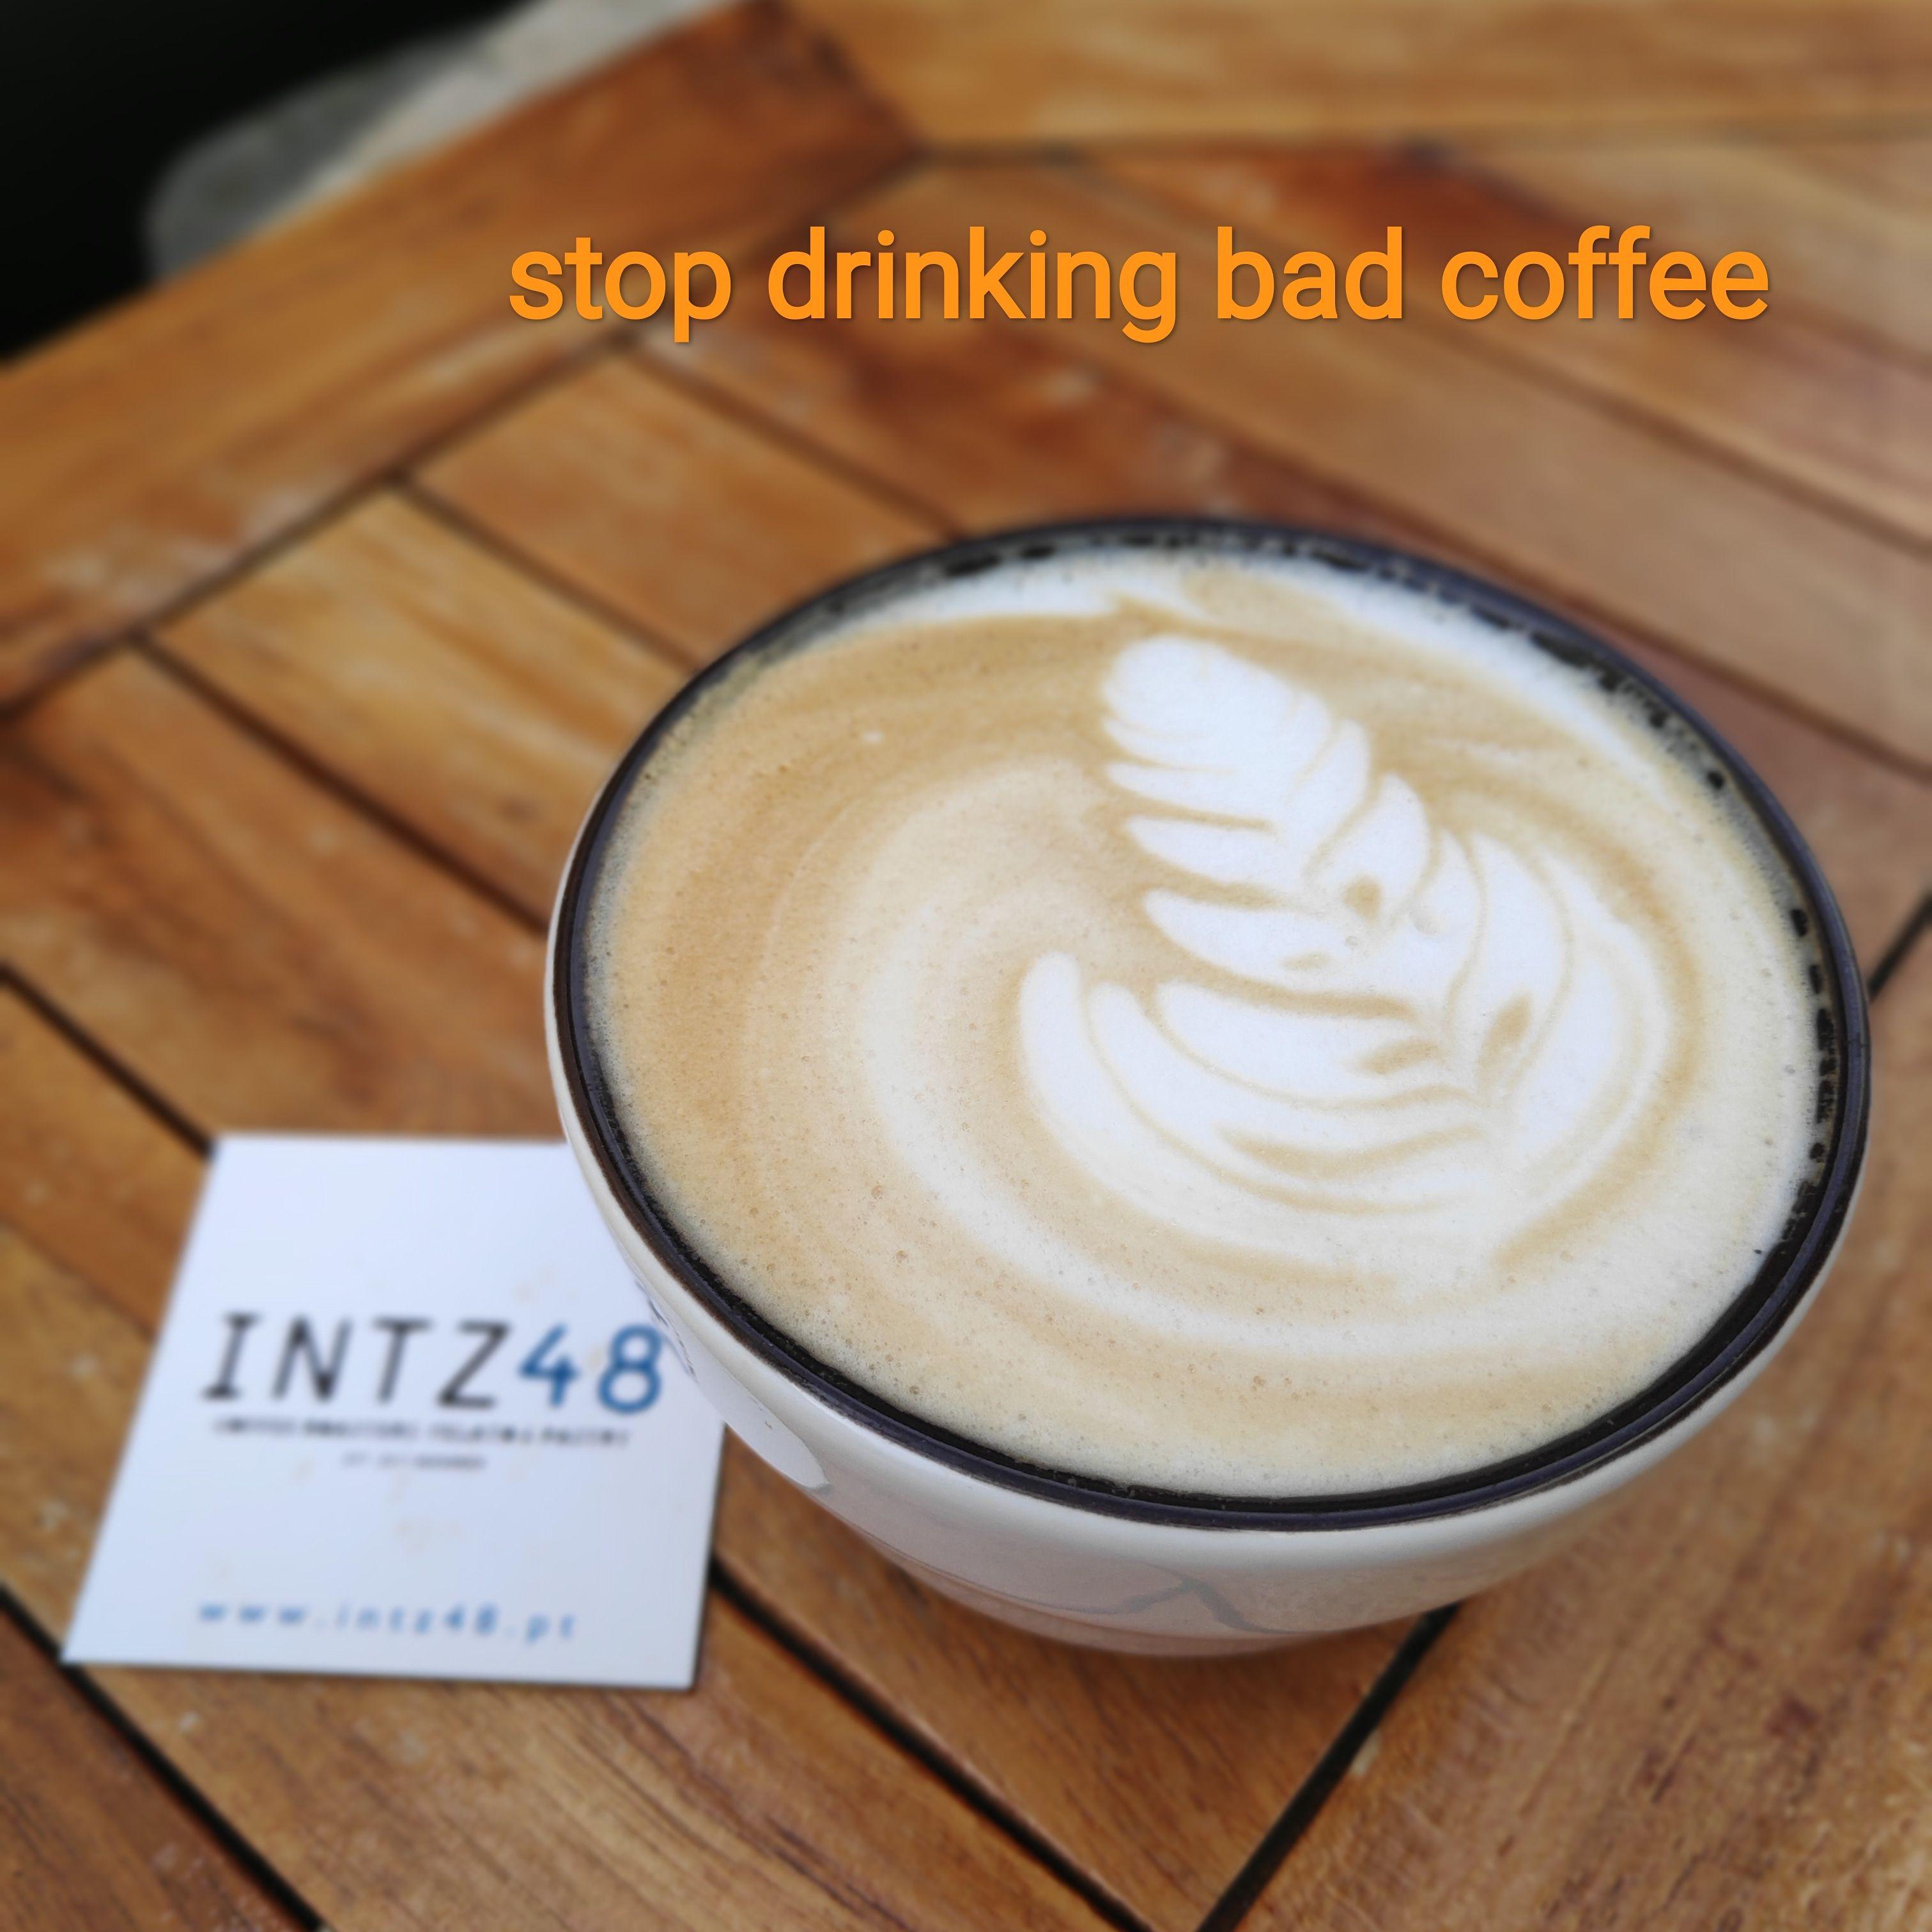 Speciality coffee Azores Islands